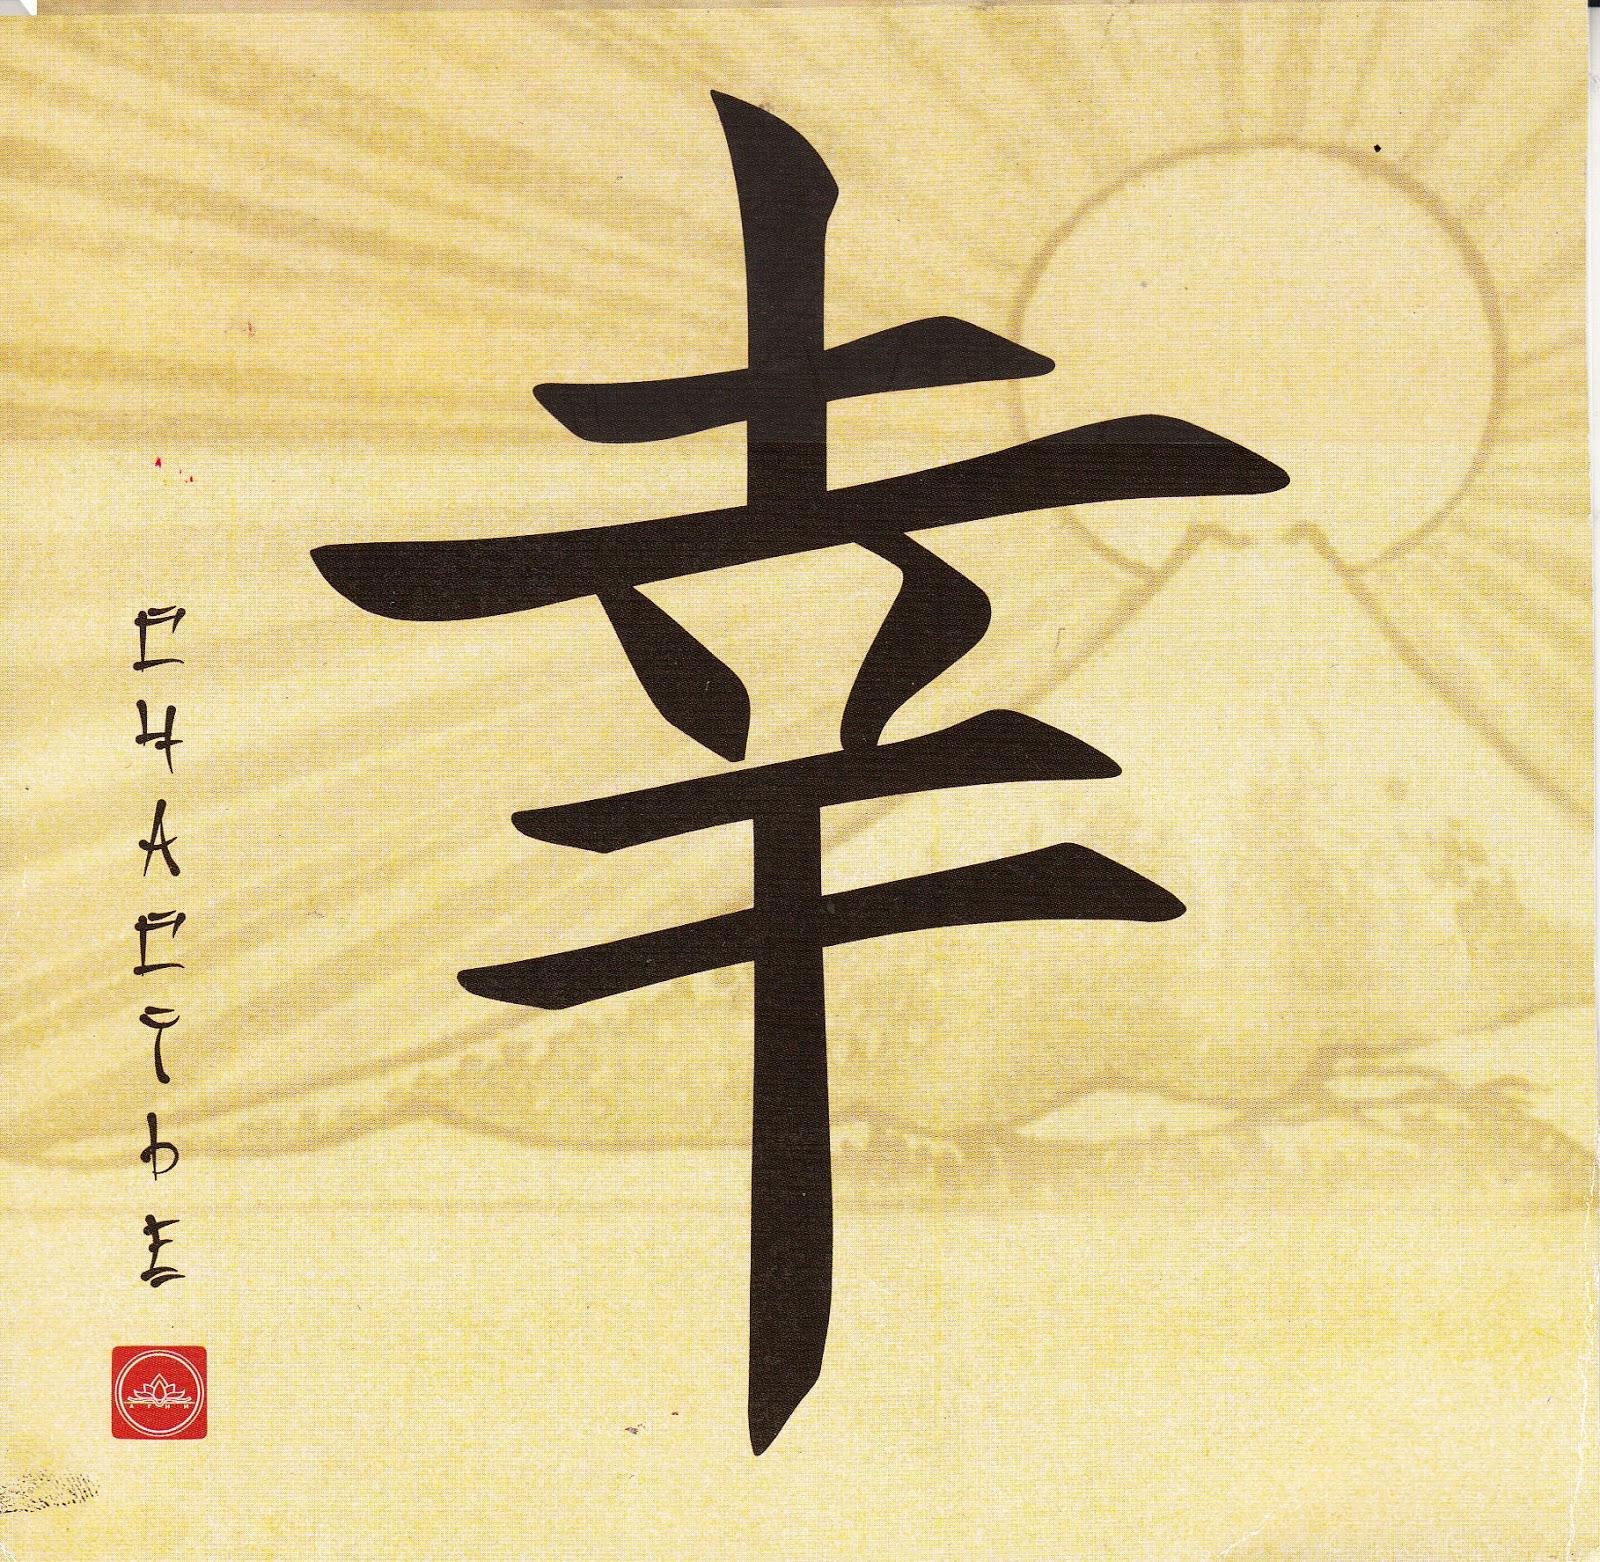 удача на японском иероглиф фото представляет собой